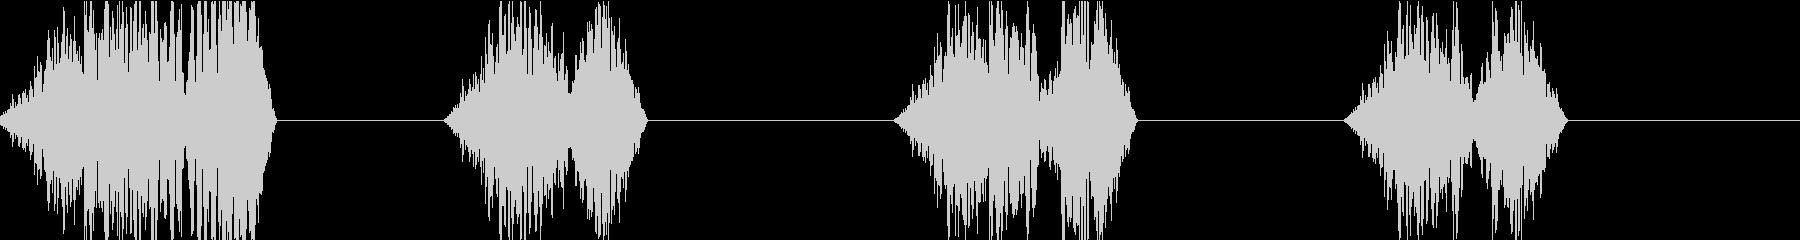 DJプレイ スクラッチ・ノイズ 190の未再生の波形